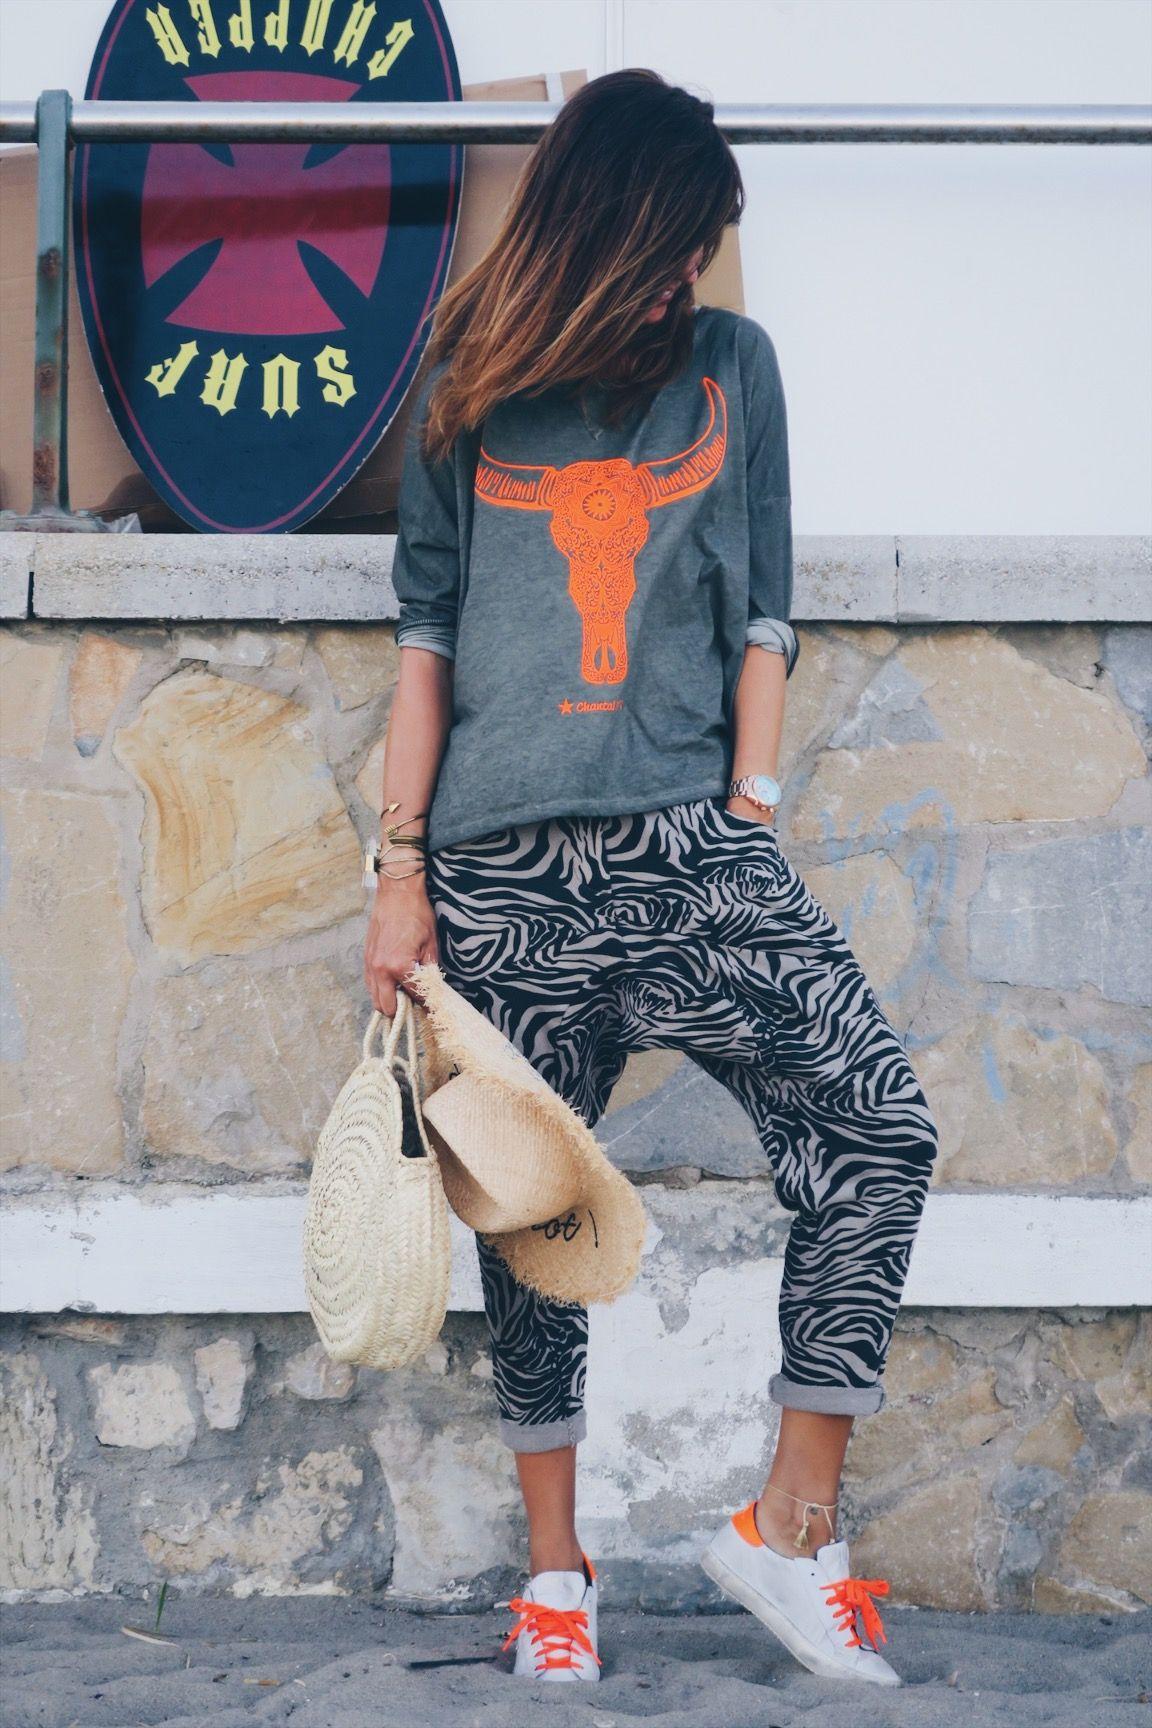 Surfing Usa | Moda relajada, Moda para mujer, Moda